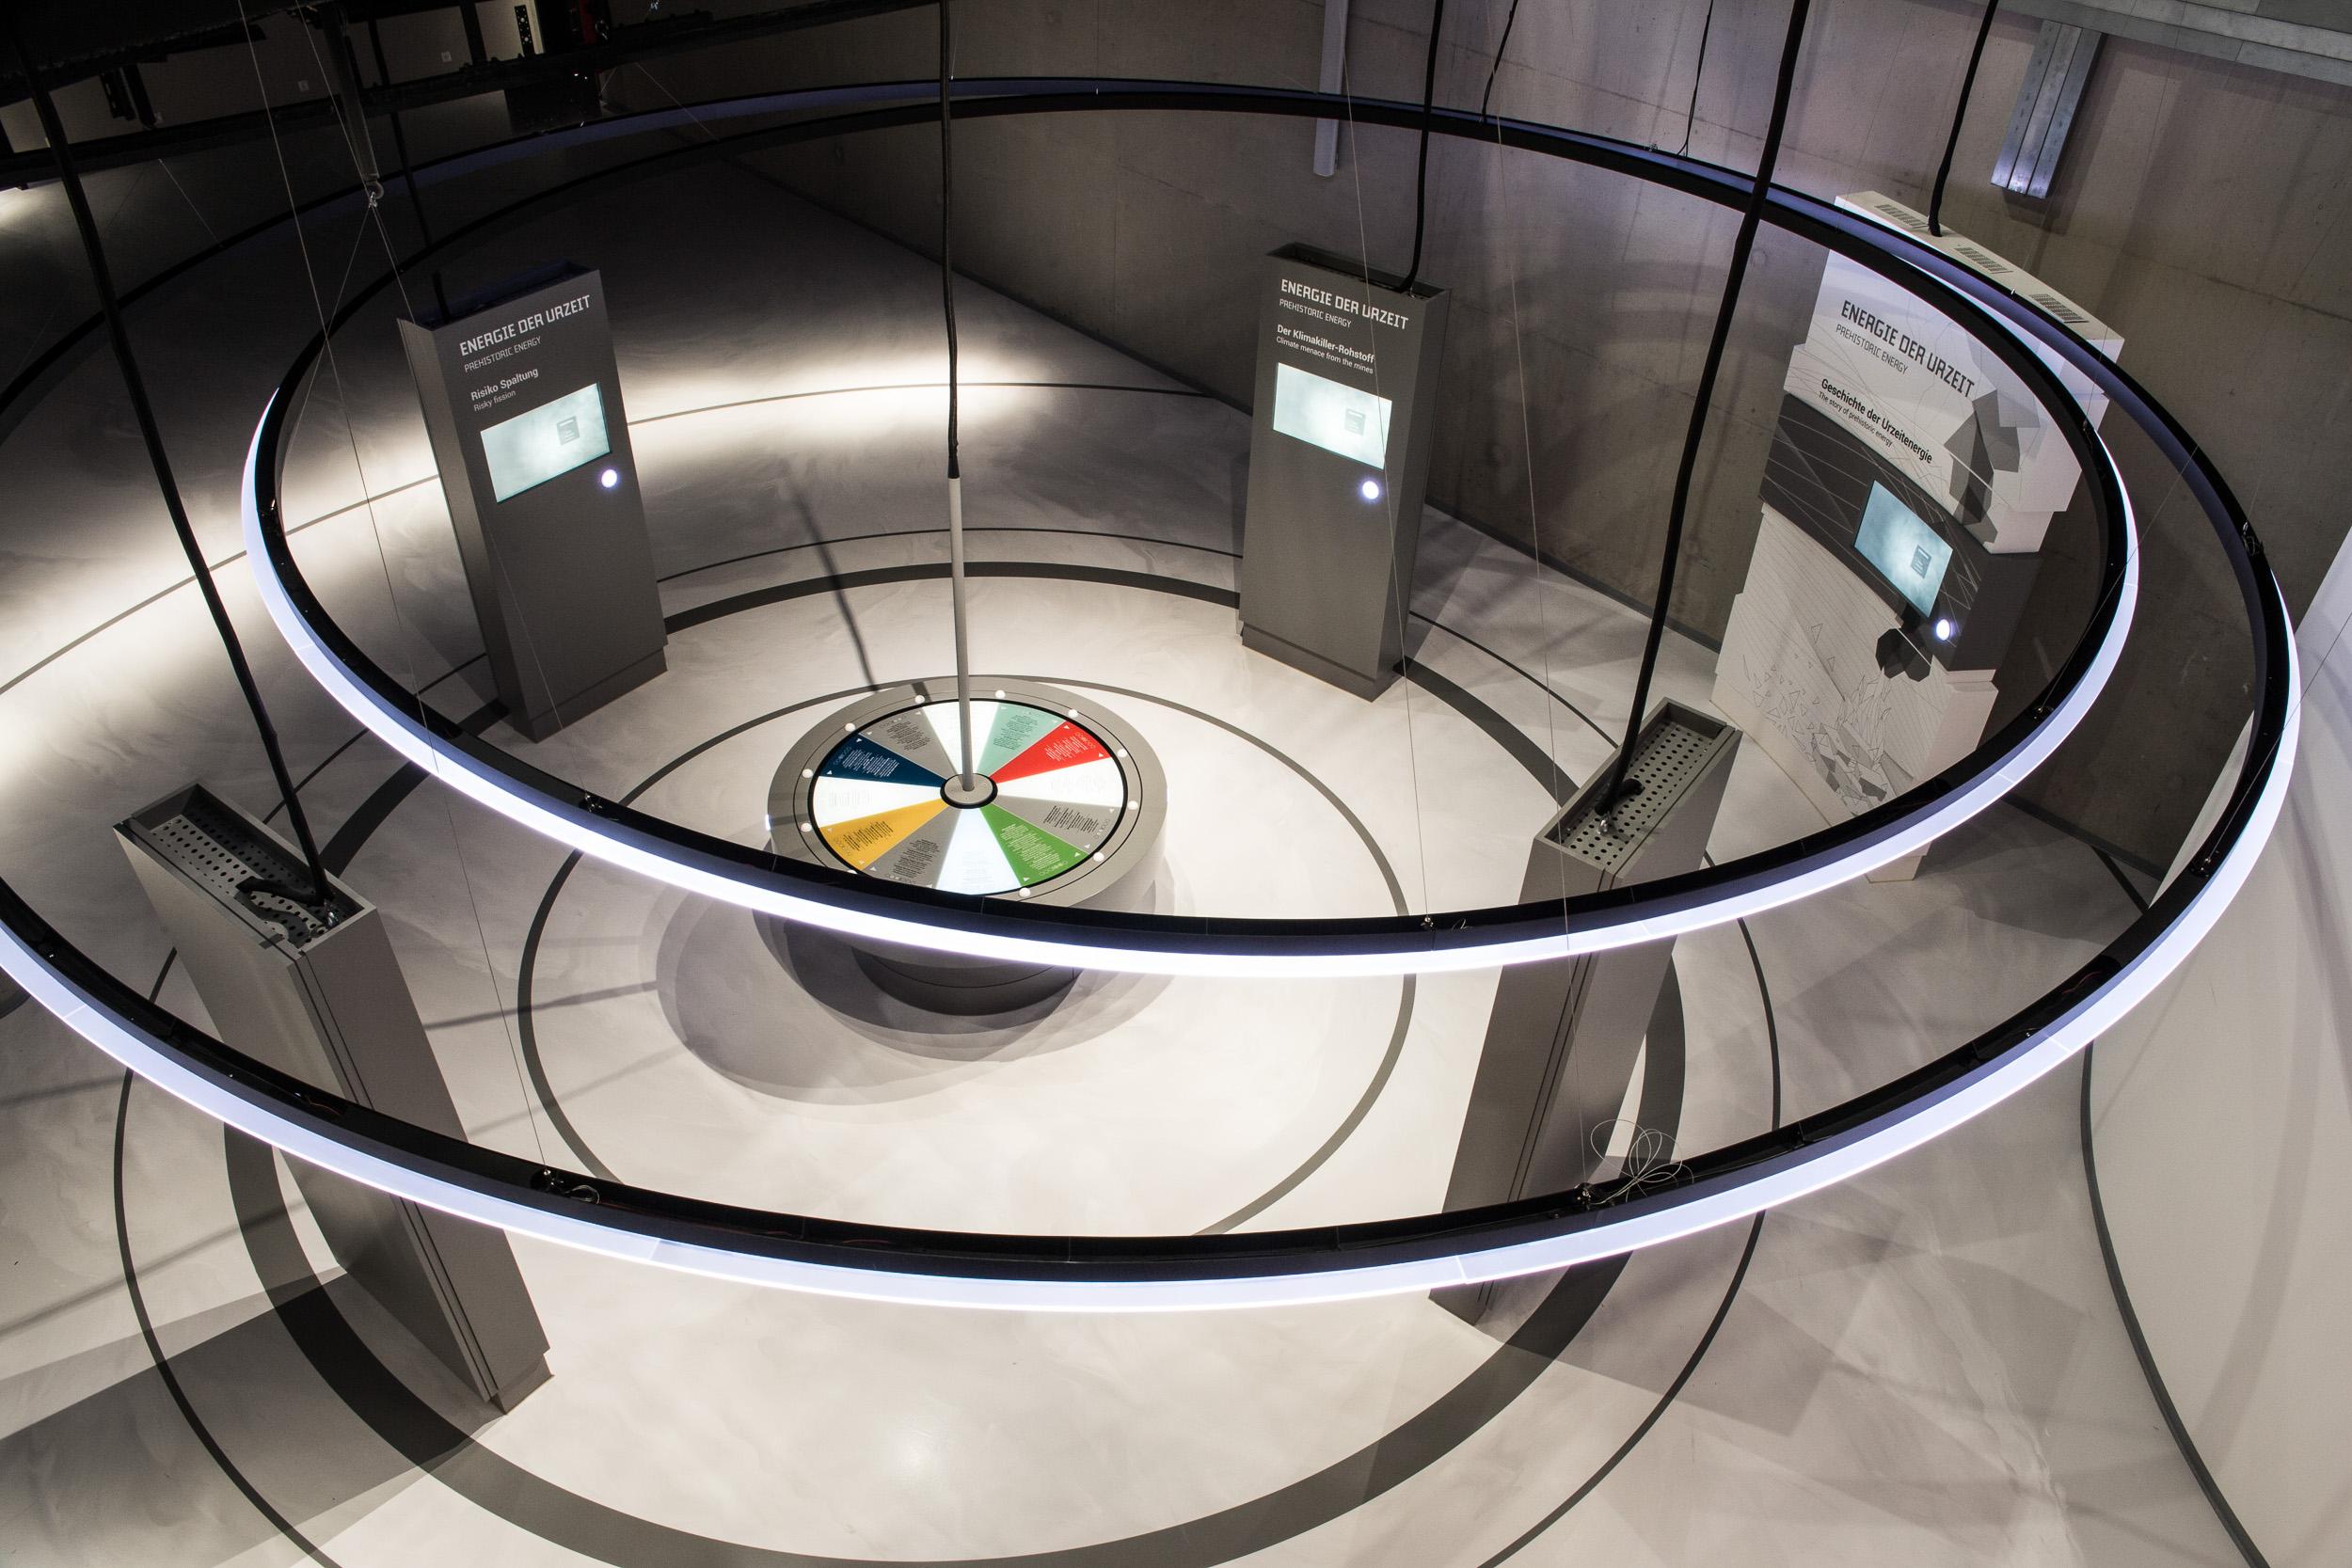 EEZ_Aurich_Design_Fußbodengestaltung